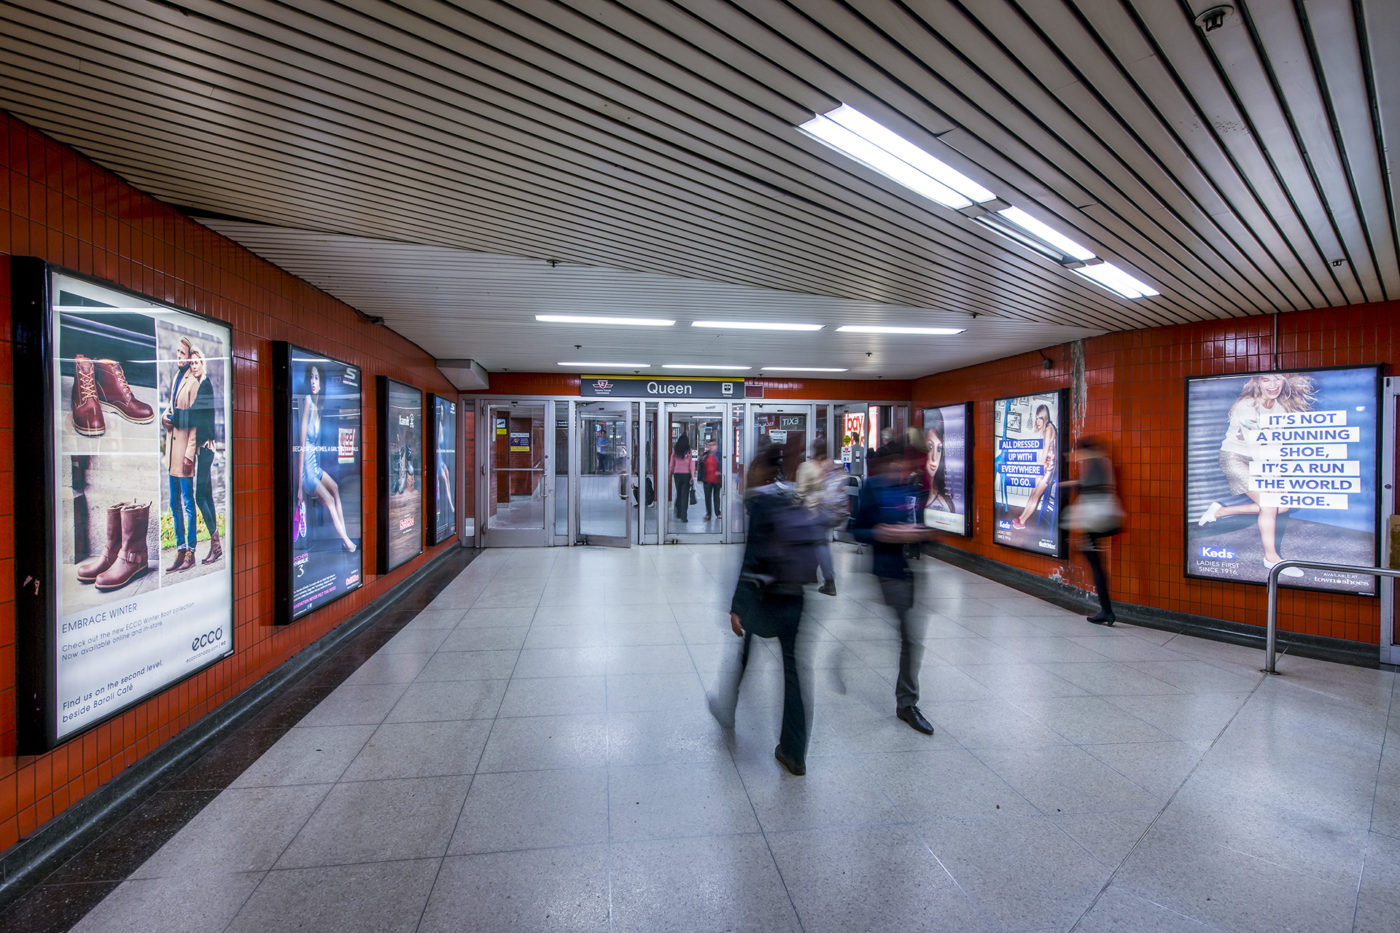 Malls - CF Eaton Centre - Mall Posters (Toronto, Ontario)